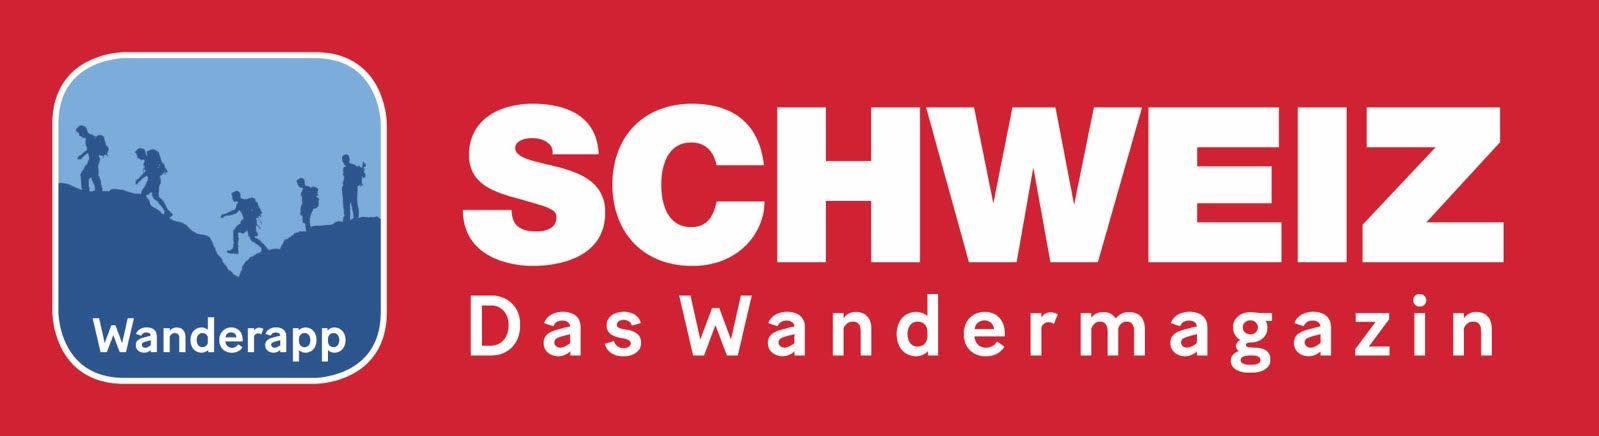 Rothus Medien AG, Wandermagazin SCHWEIZ